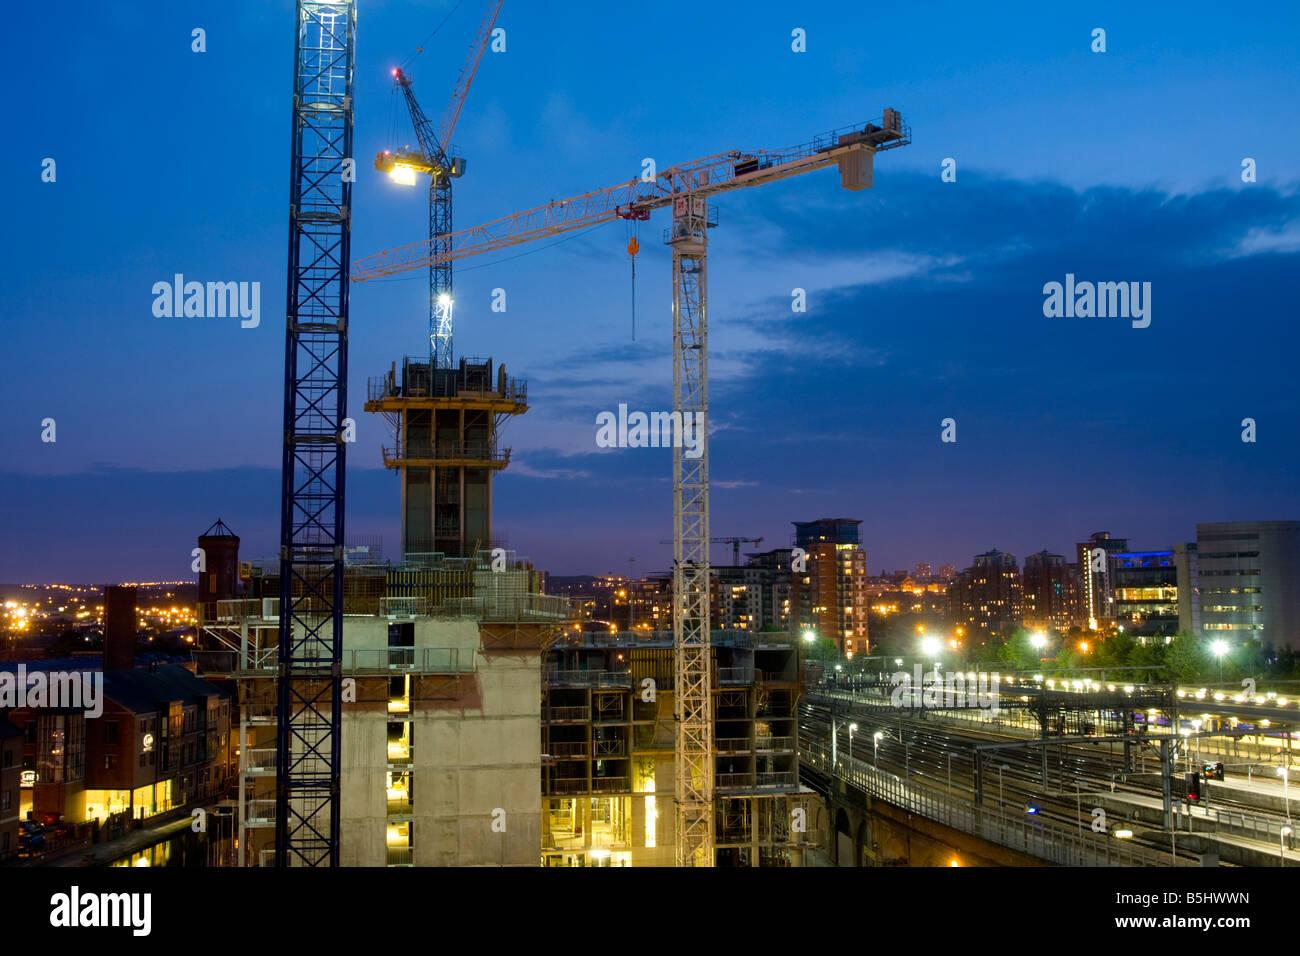 Building work and Leeds train station at dusk UK - Stock Image